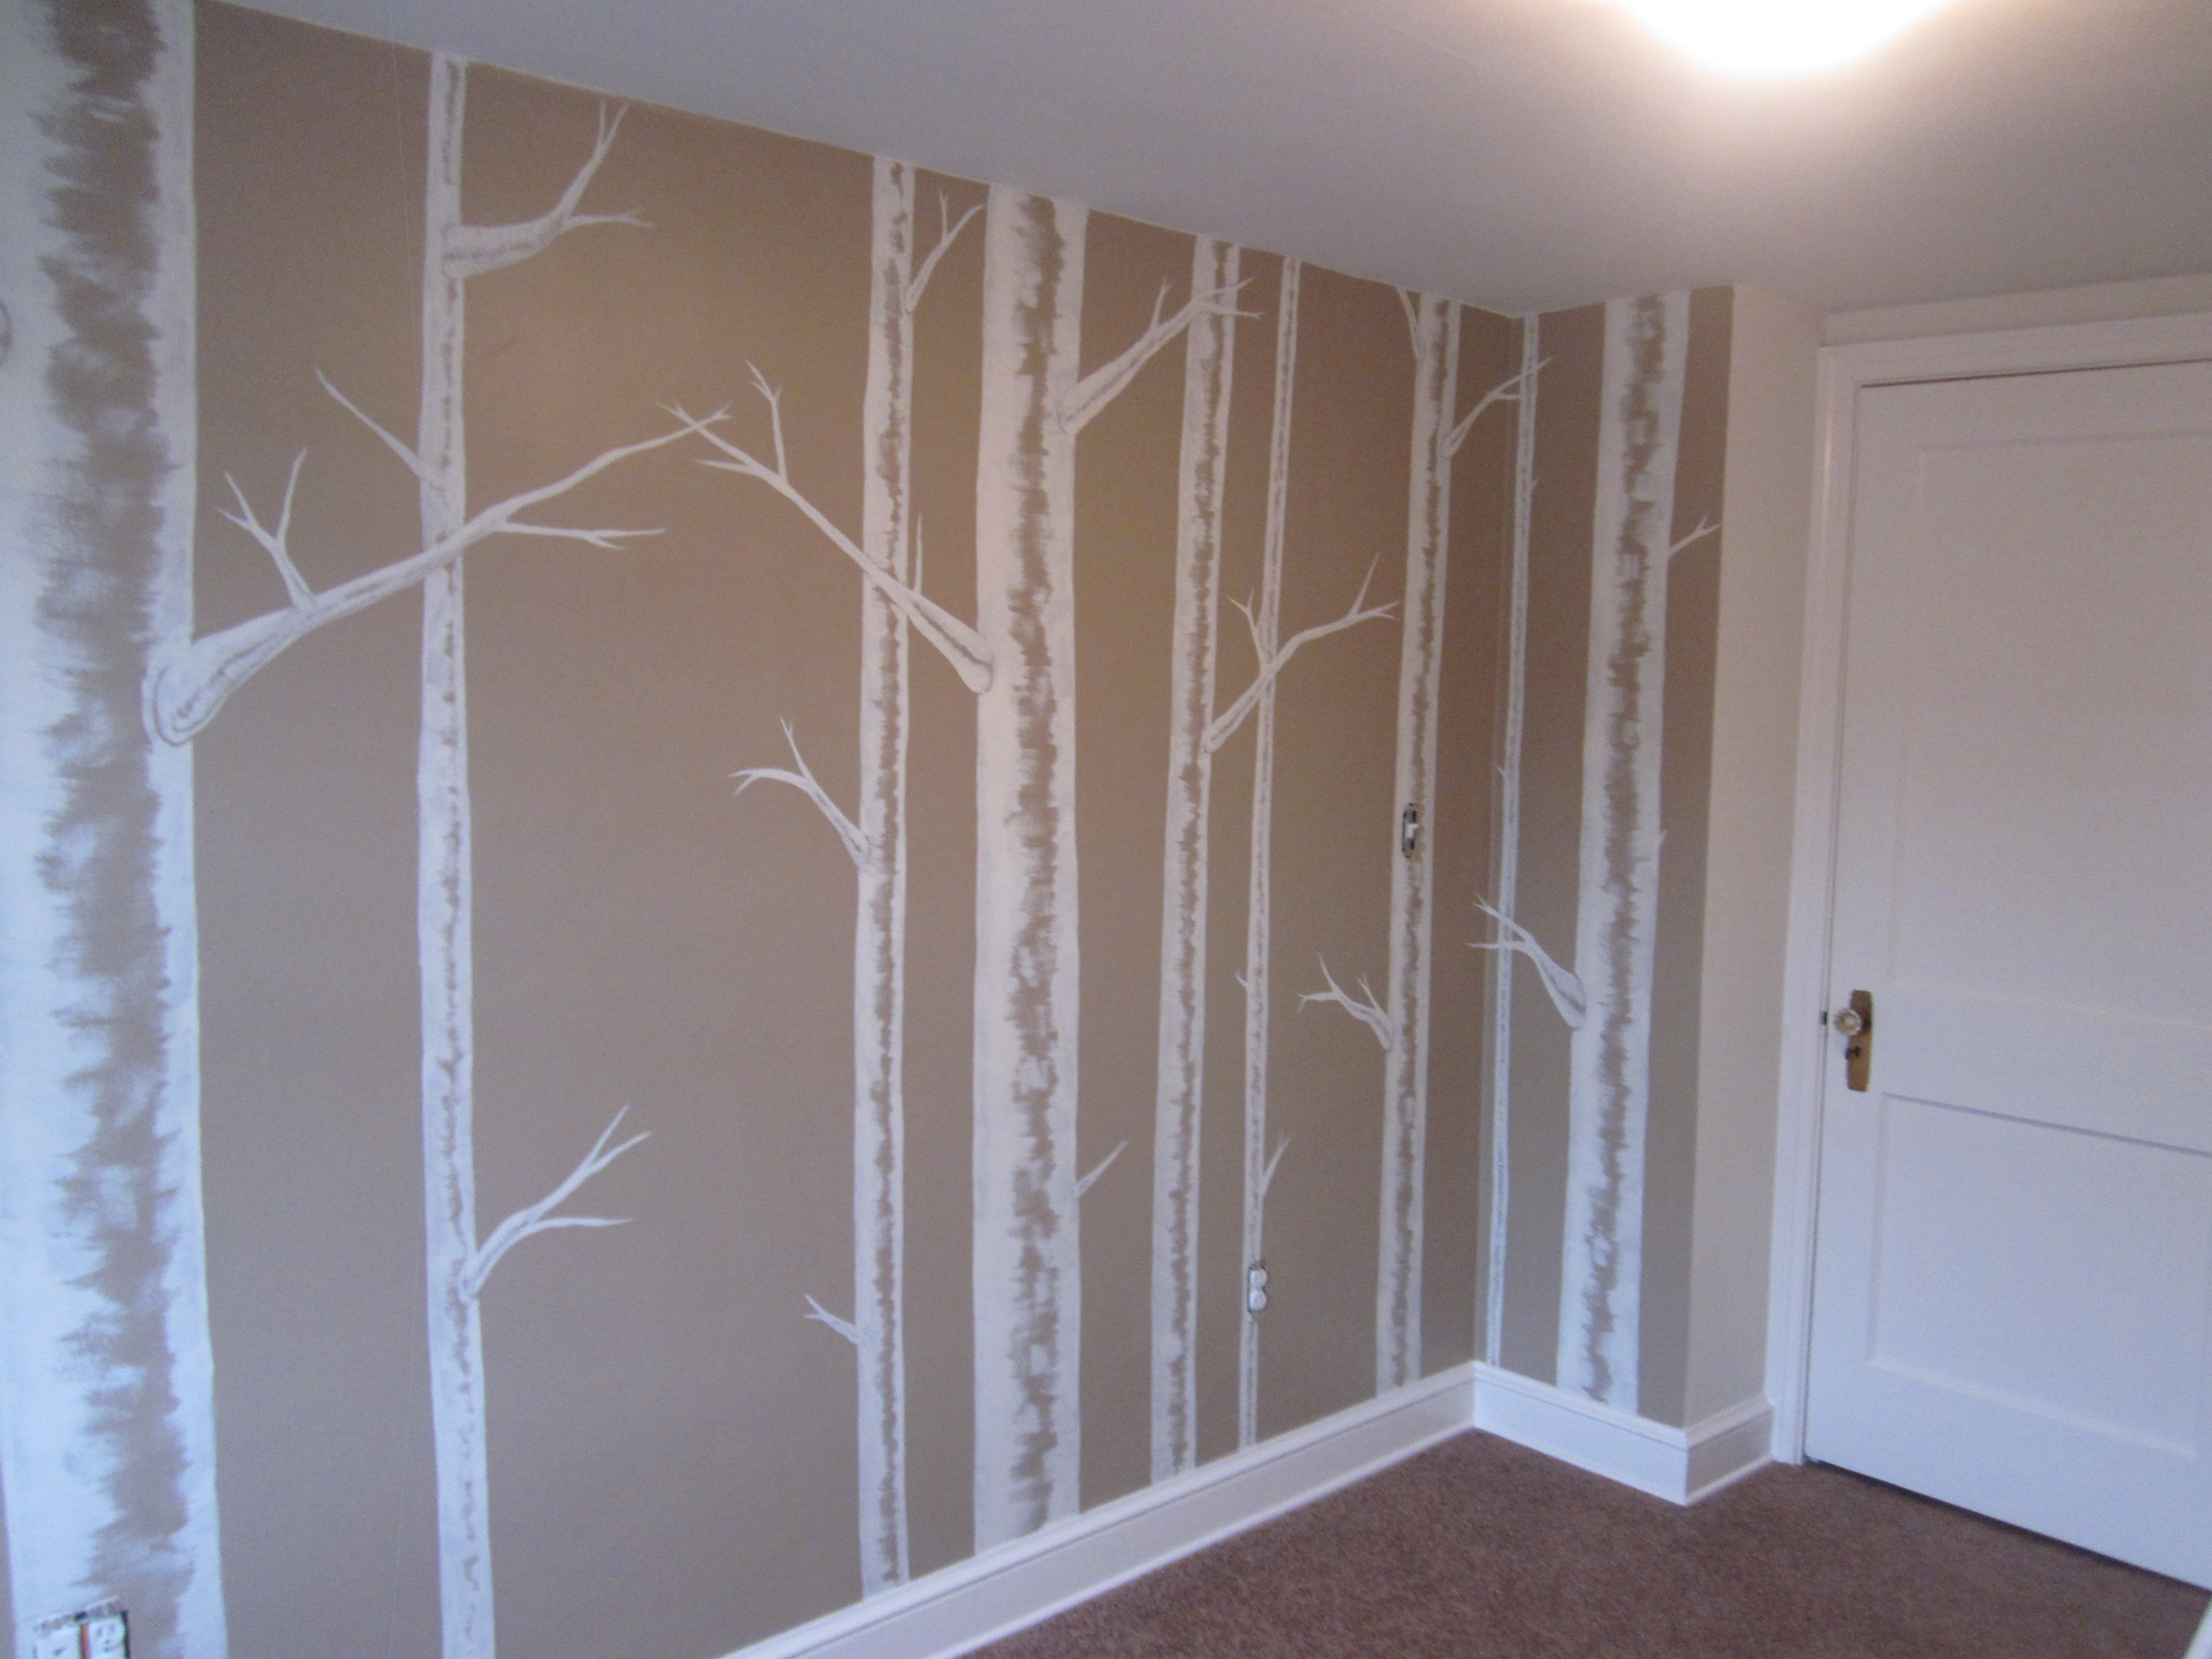 sherwin williams wallpaper murals 3264x2448